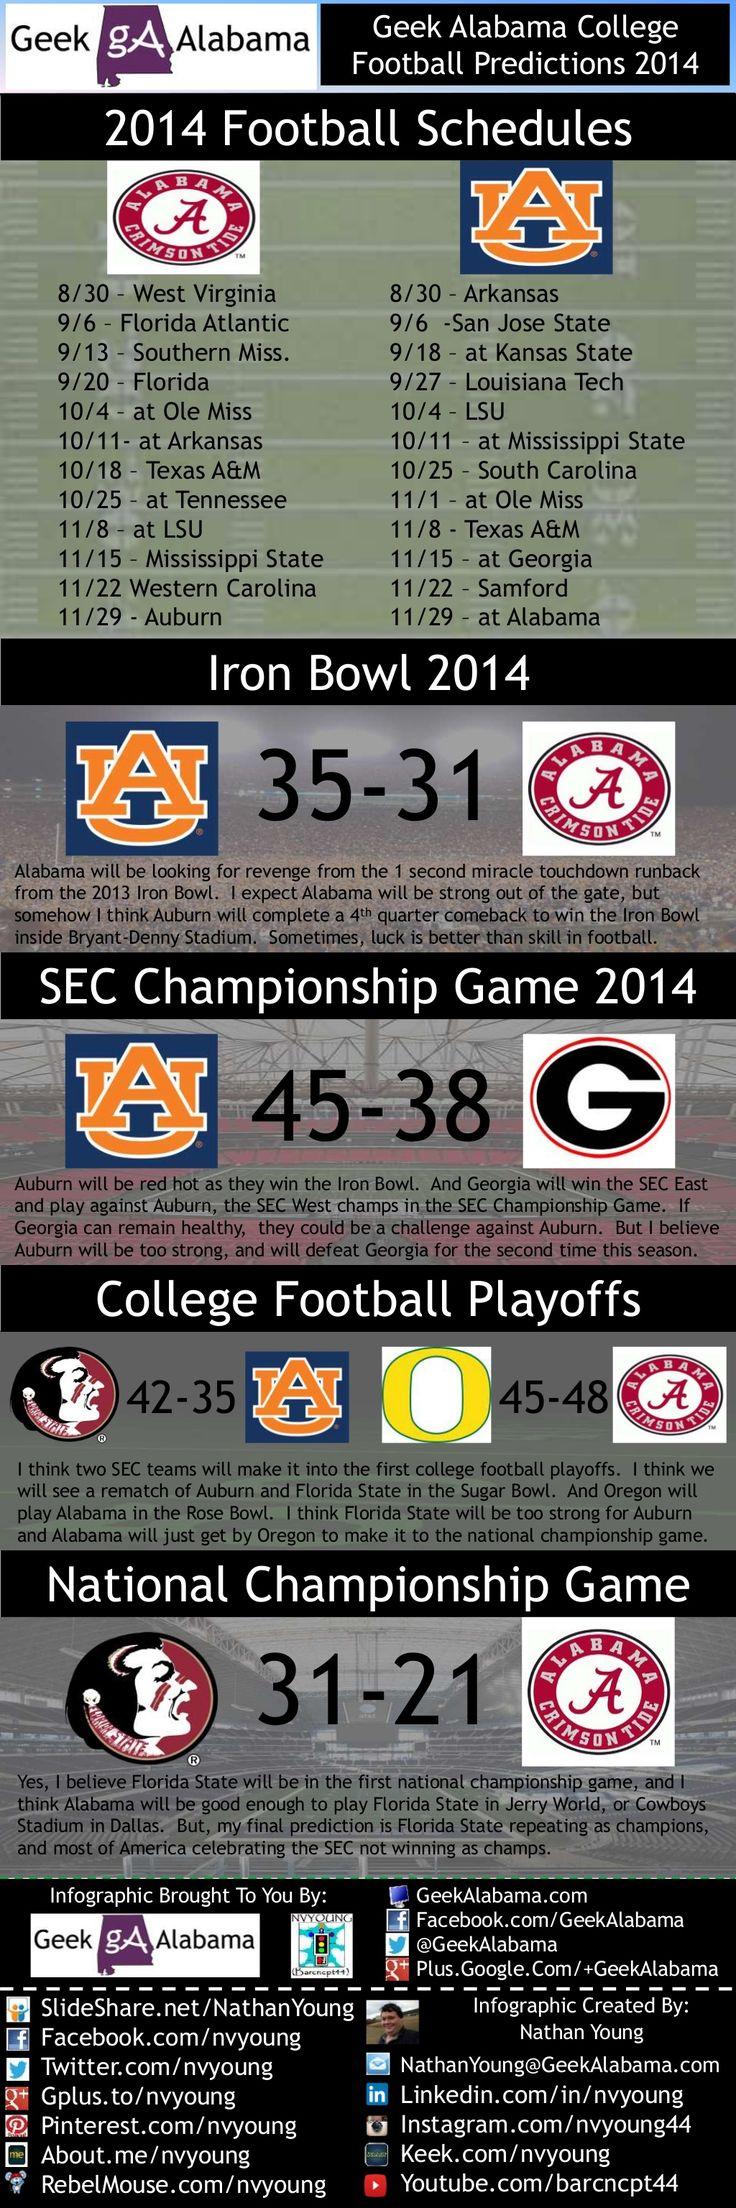 Geek Alabama College Football Predictions 2014.